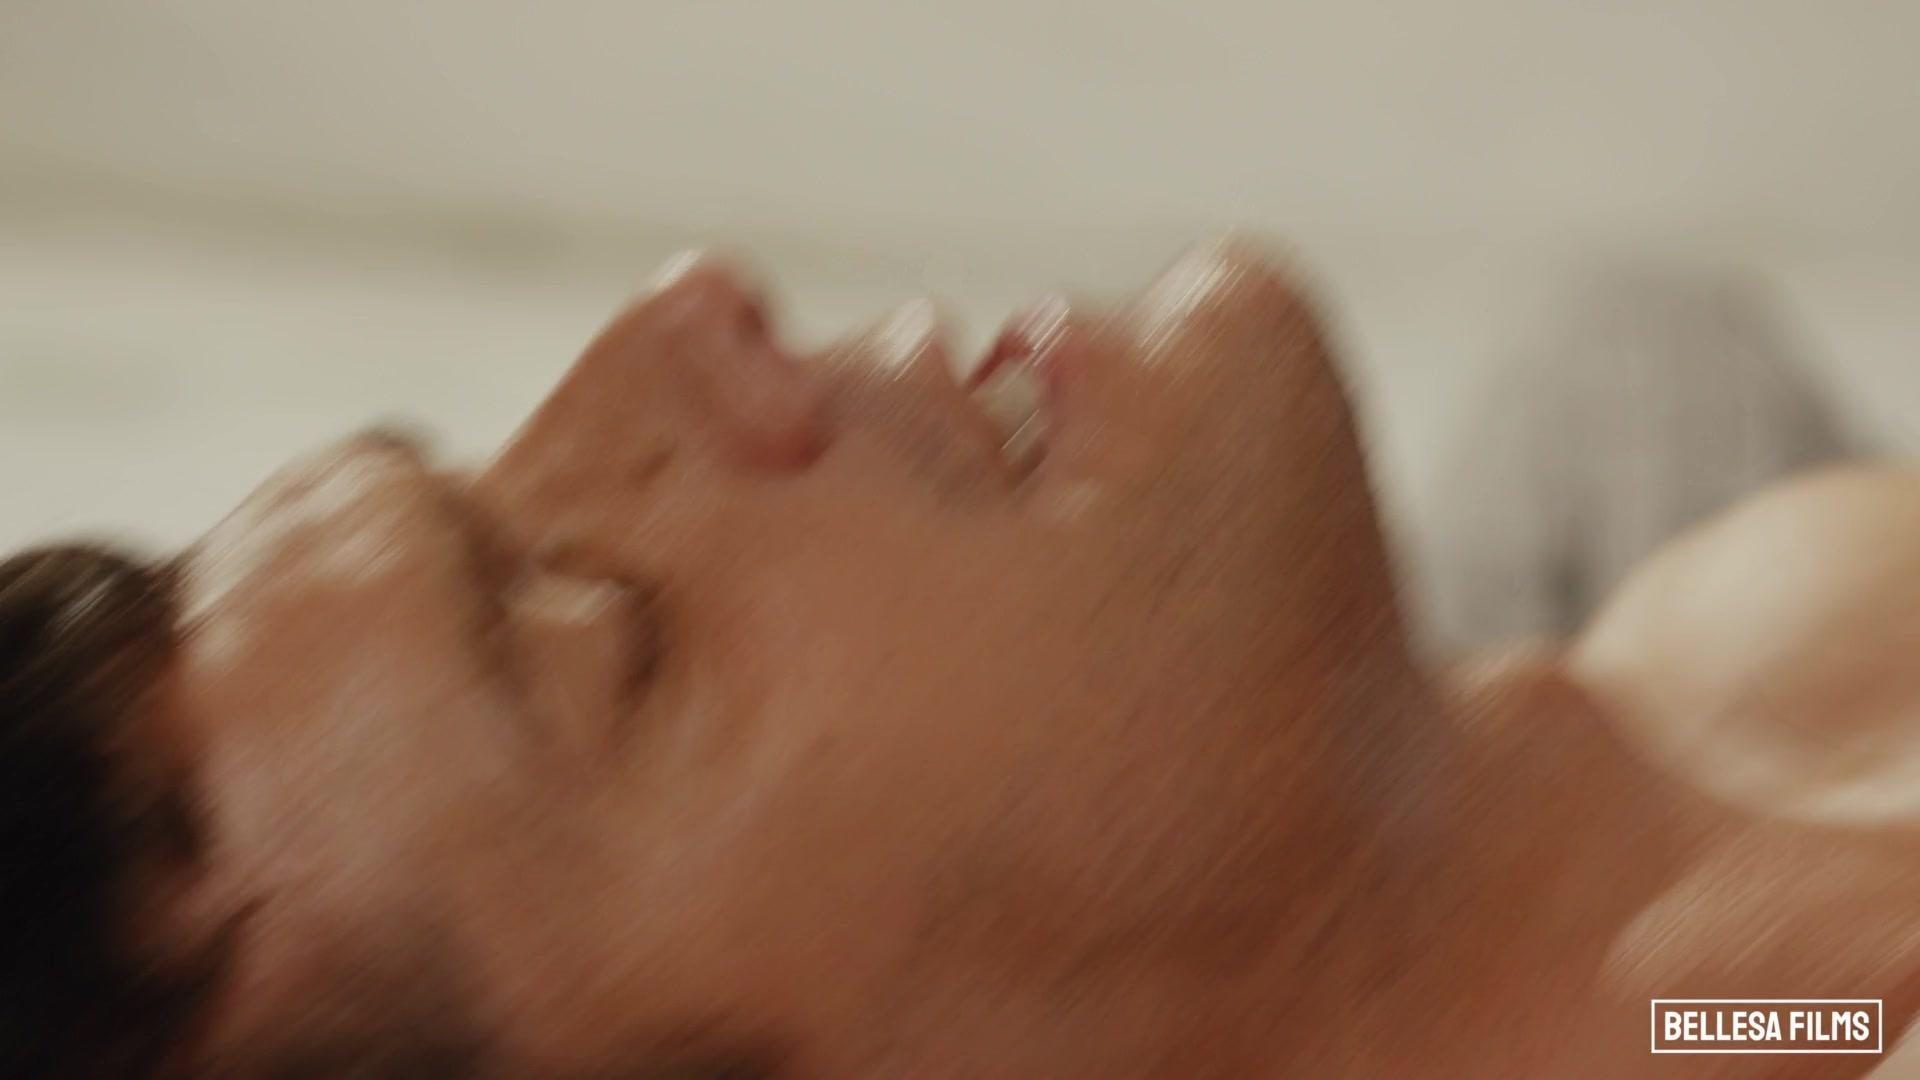 Bellesafilms  Lacy Lennon Training Ritual